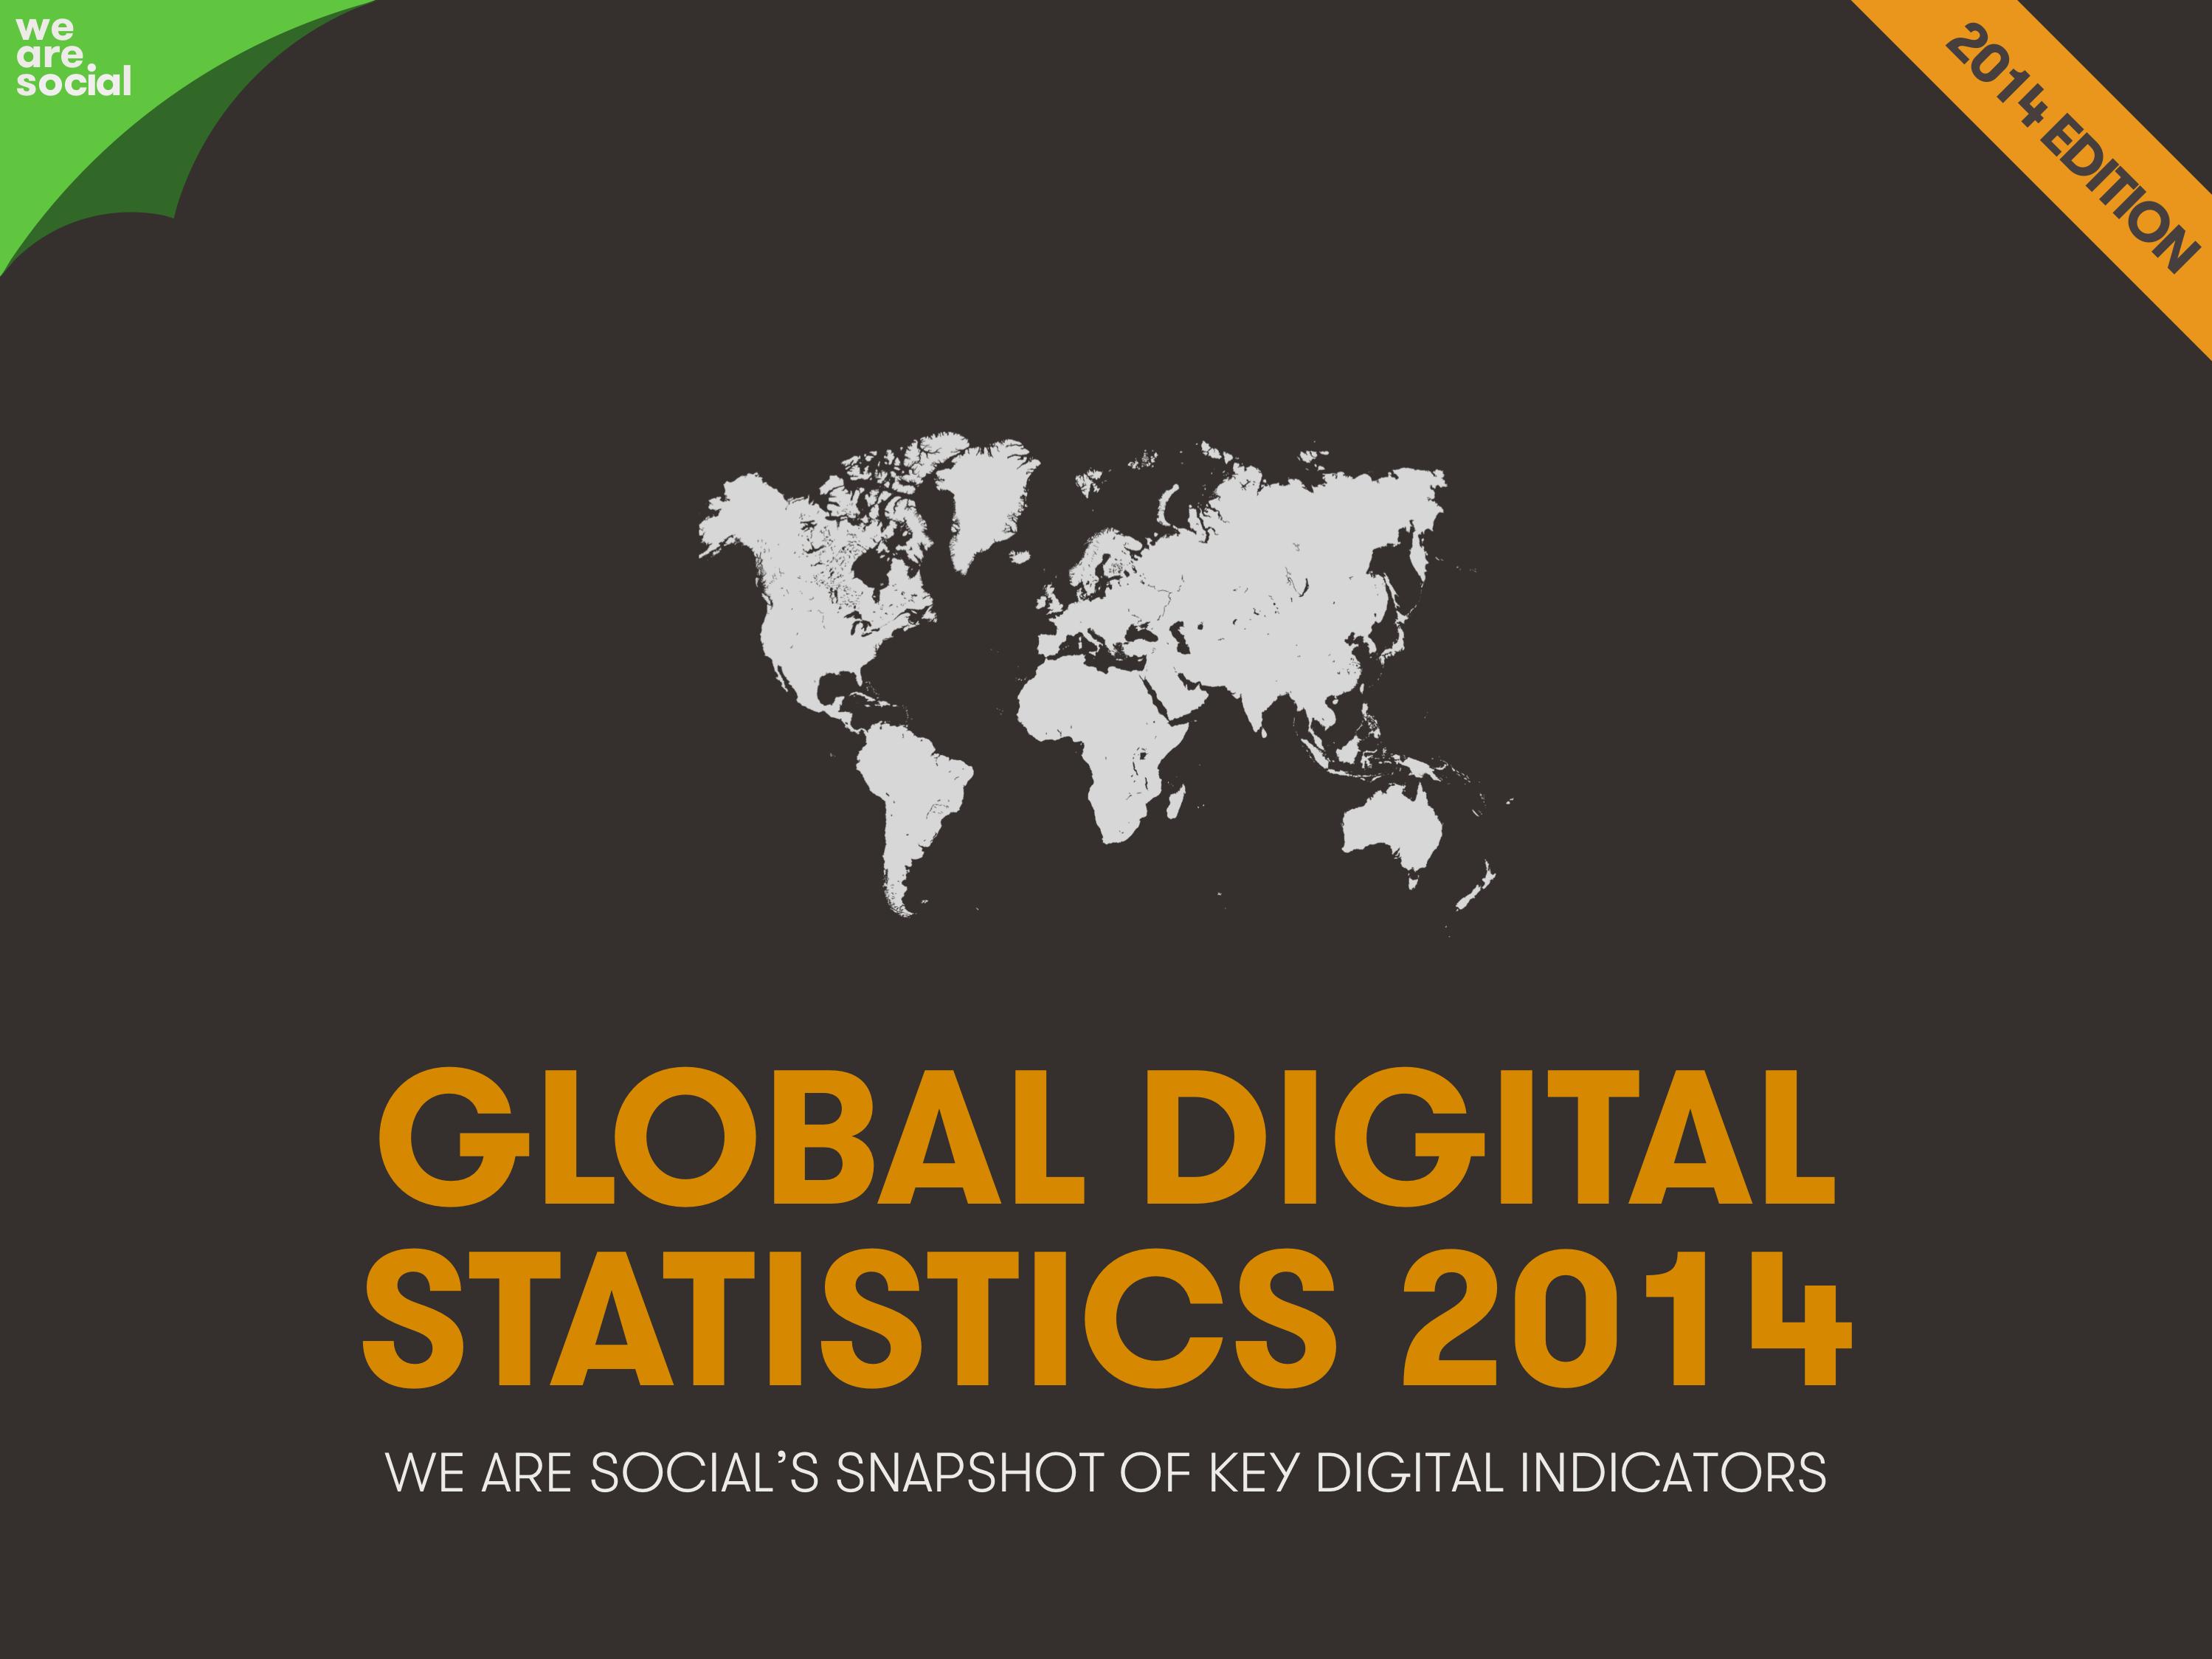 Global Digital Statistics 2014 by We Are Social